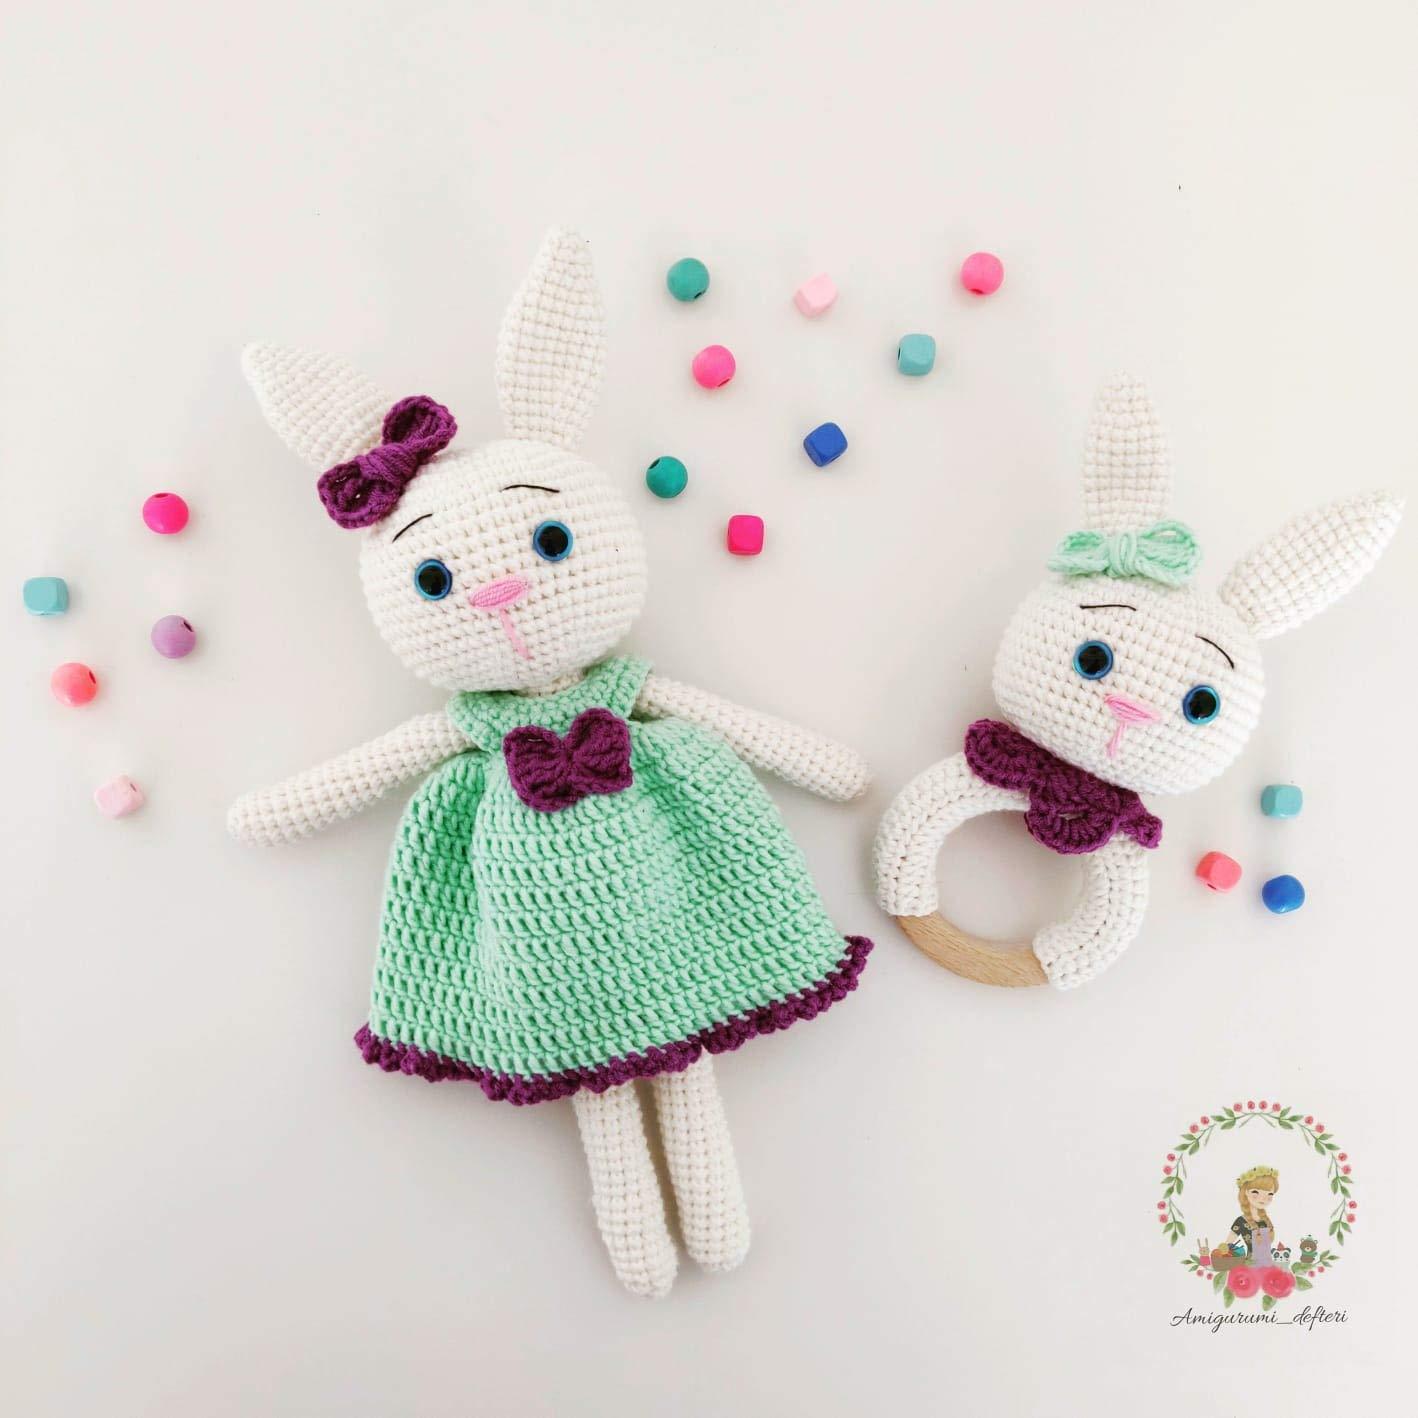 How To Make A Crochet Magic Ring - Ambassador Crochet | 1418x1418